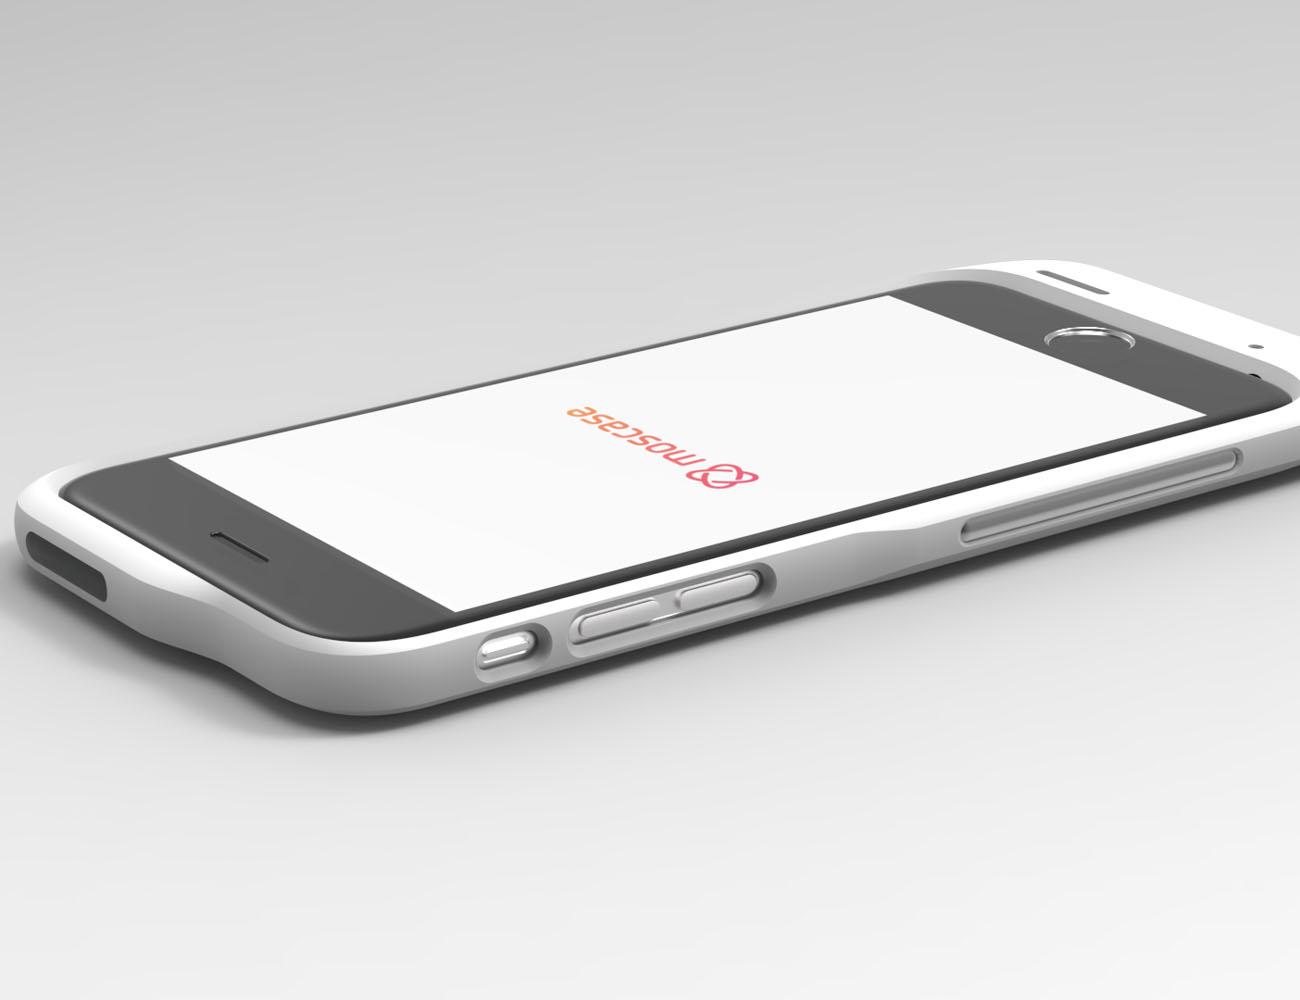 moscase – The Smartest Phone Case Ever Designed